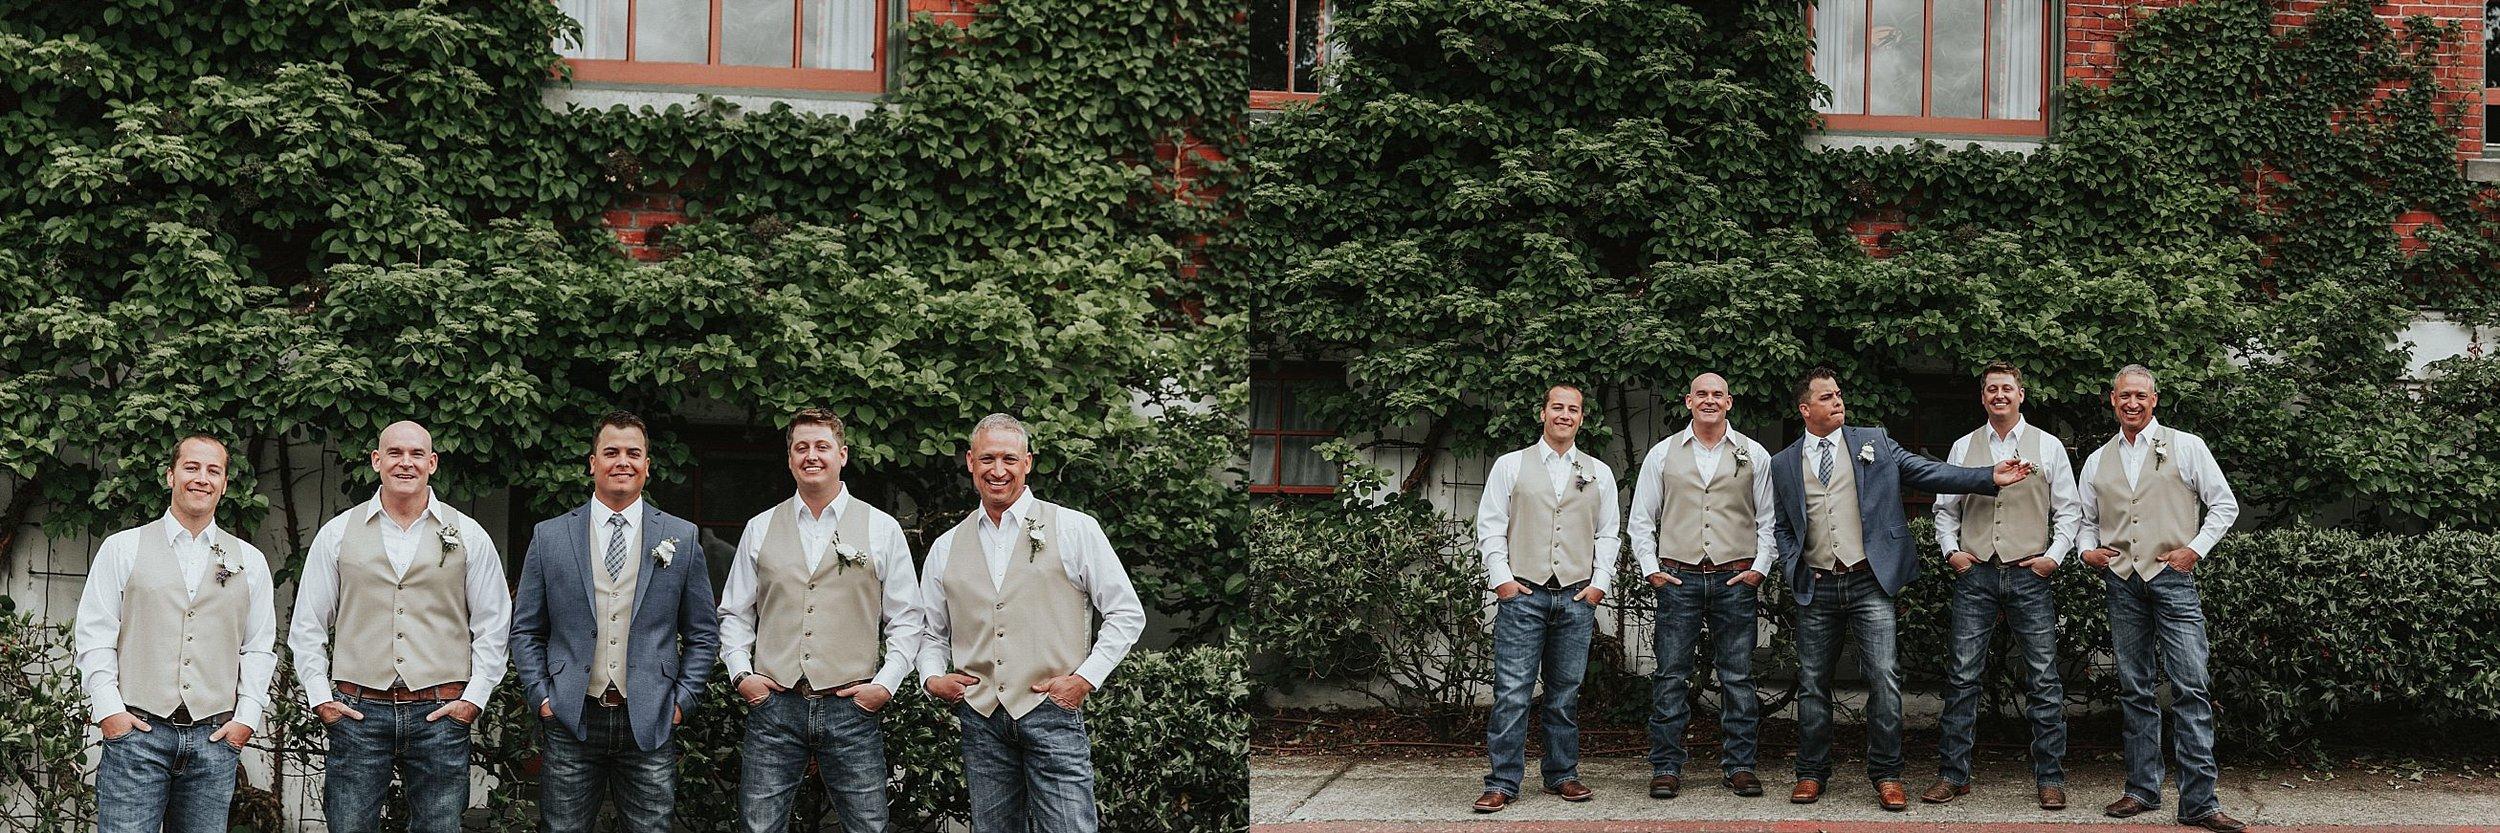 Oregon Wedding Photographer McMenamins (53).jpg